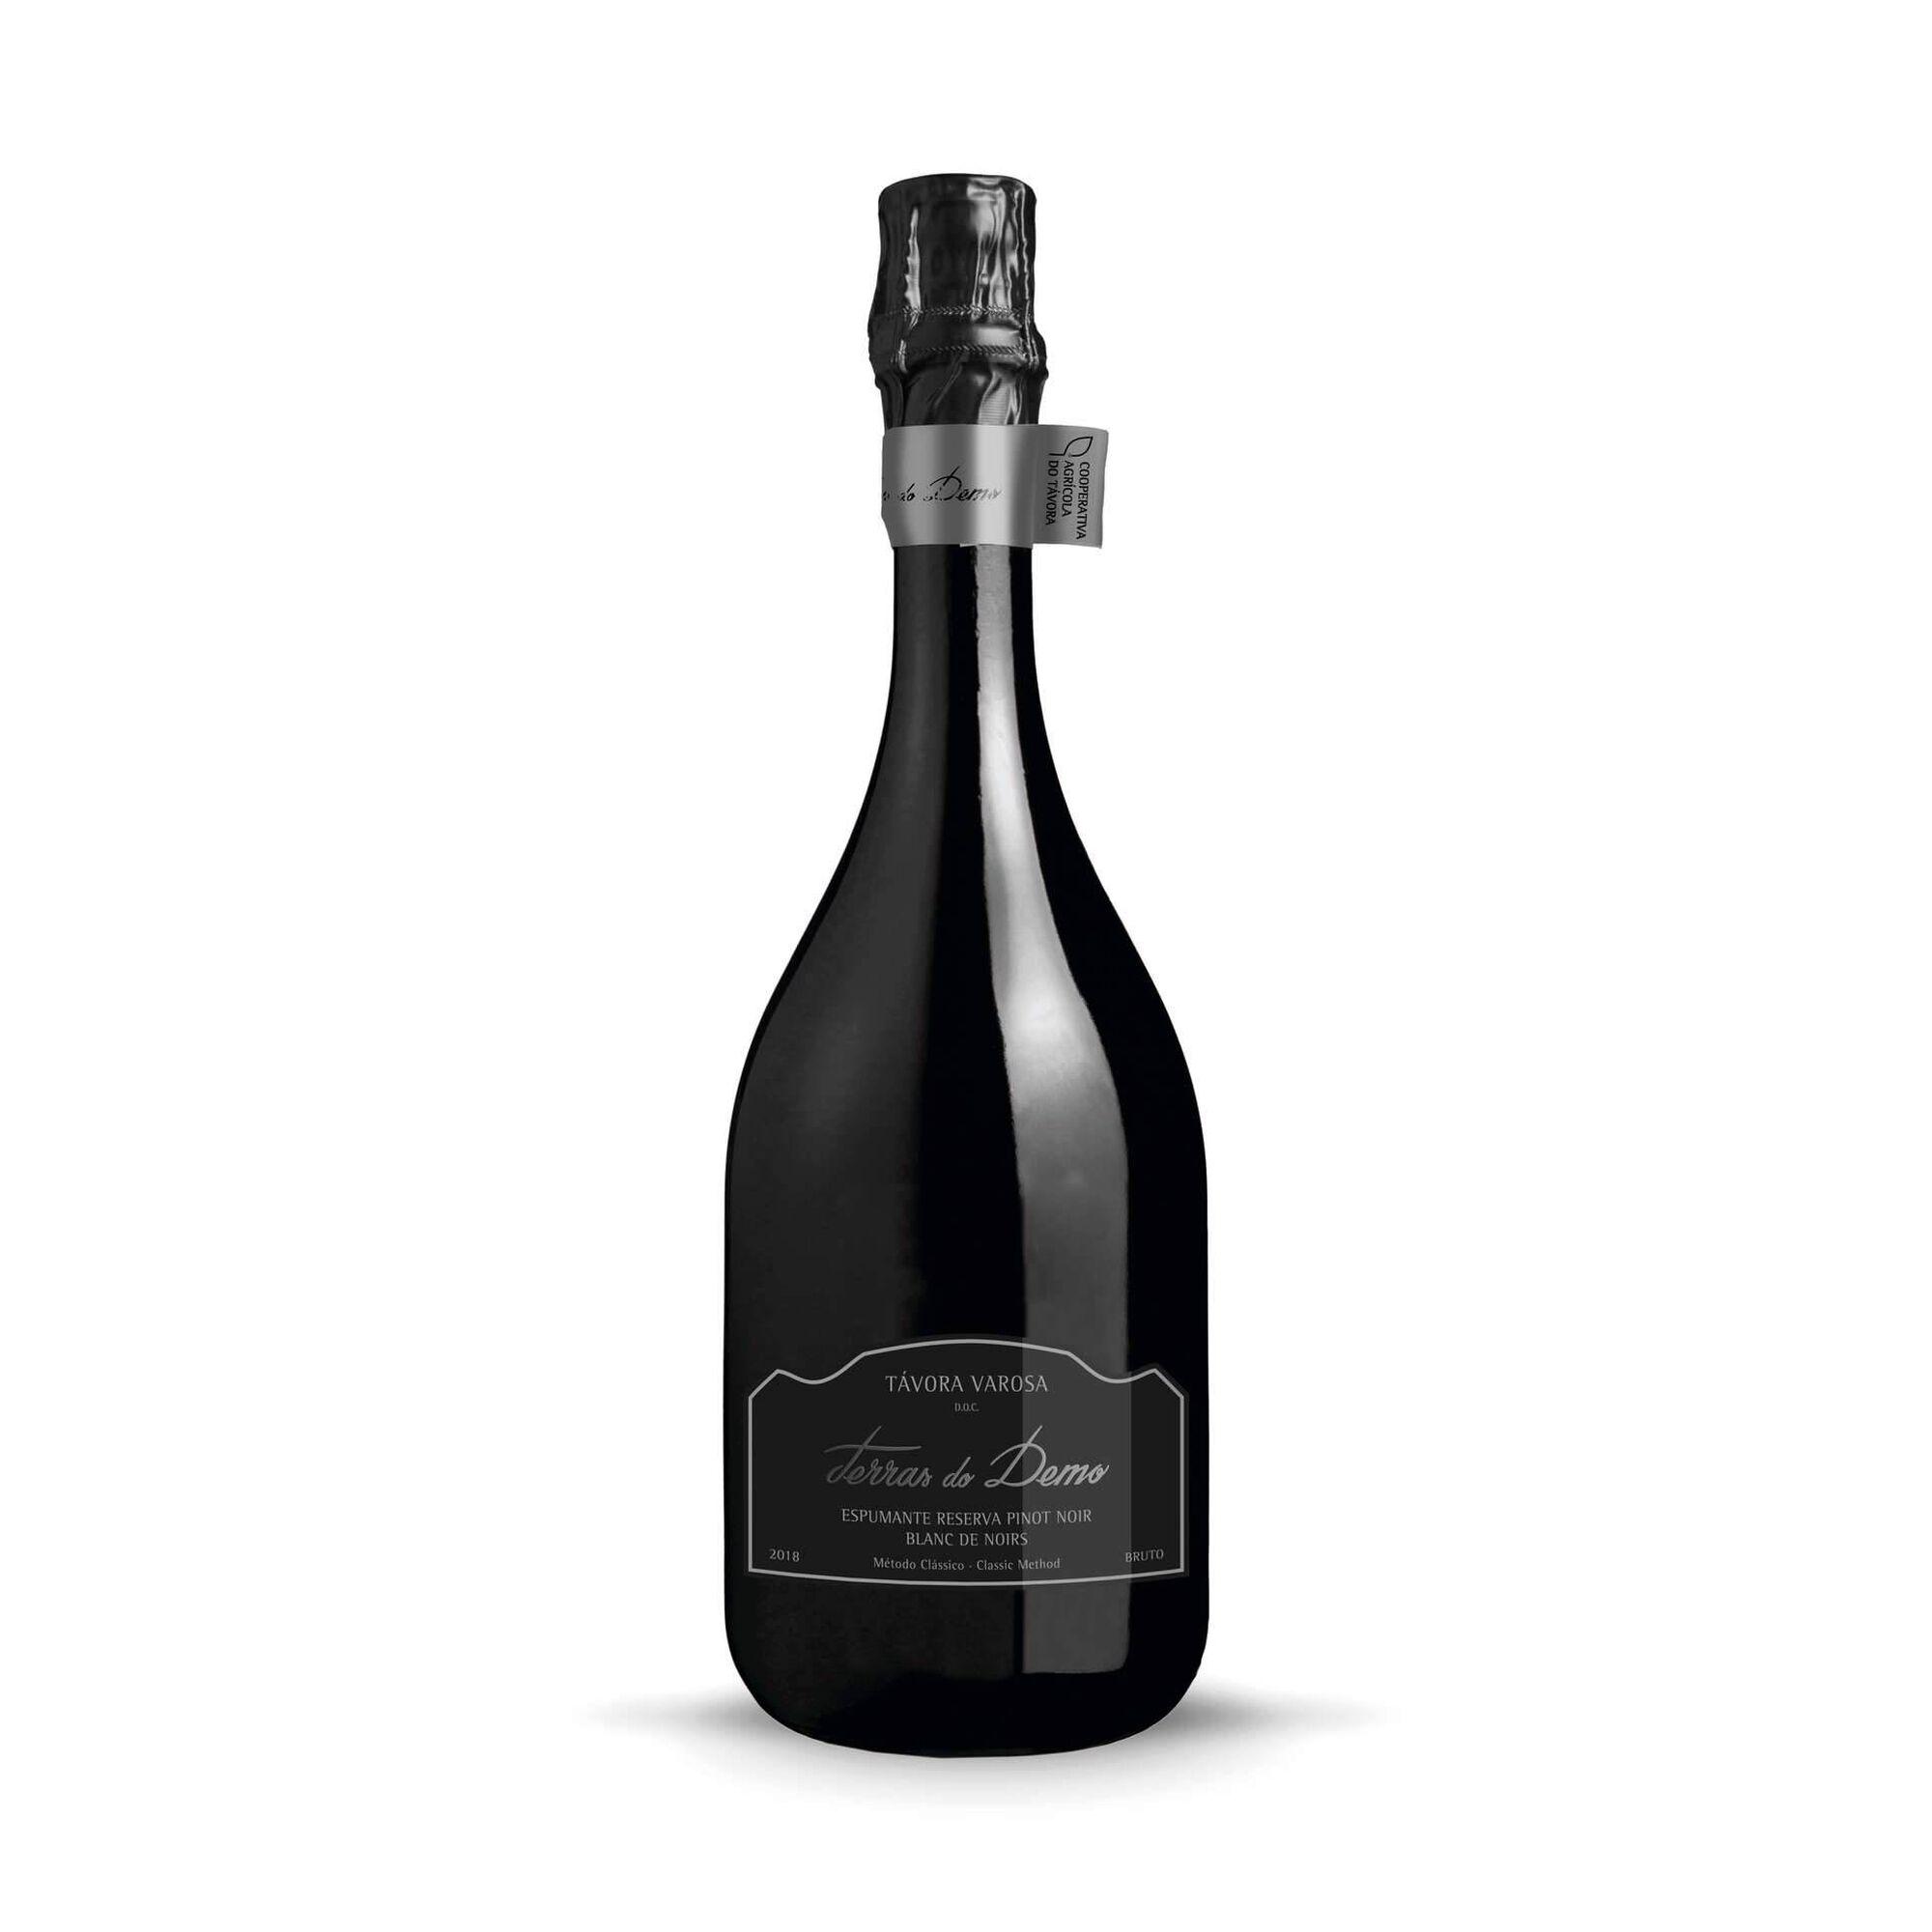 Terras do Demo Espumante Pinot Noir Branco Bruto